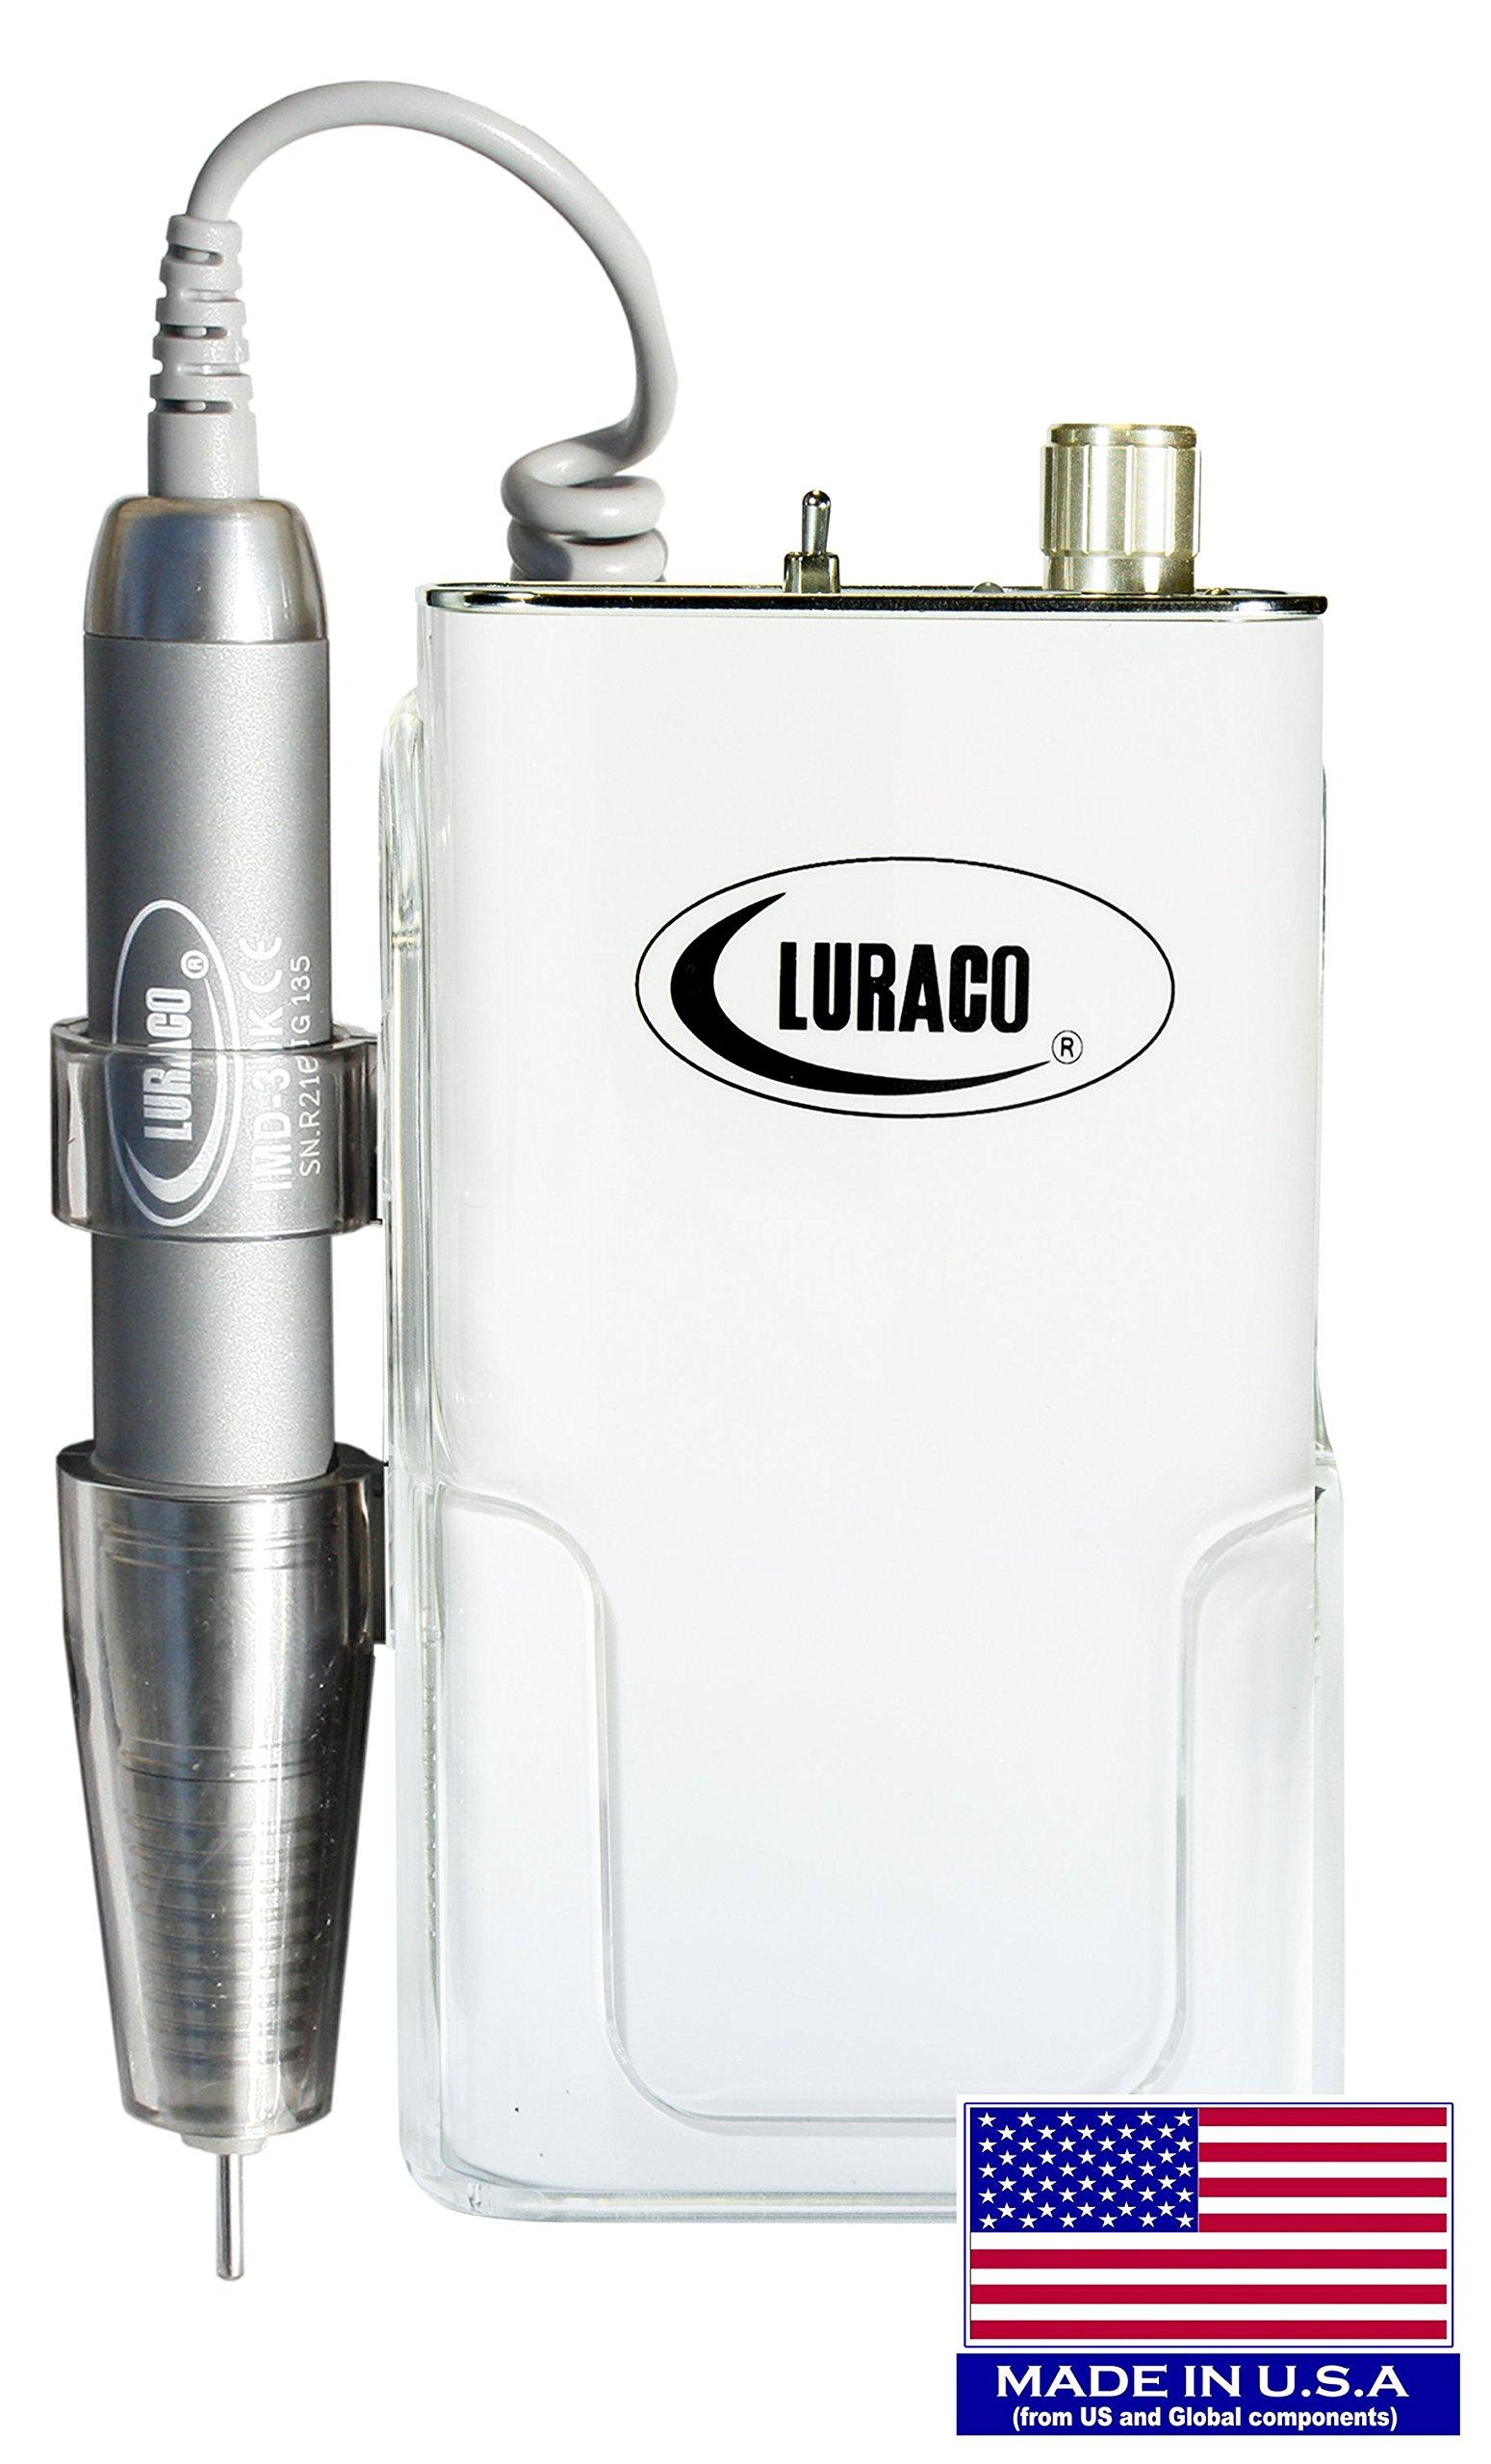 Luraco Pro-30K Electric Nail File (Drill)- White